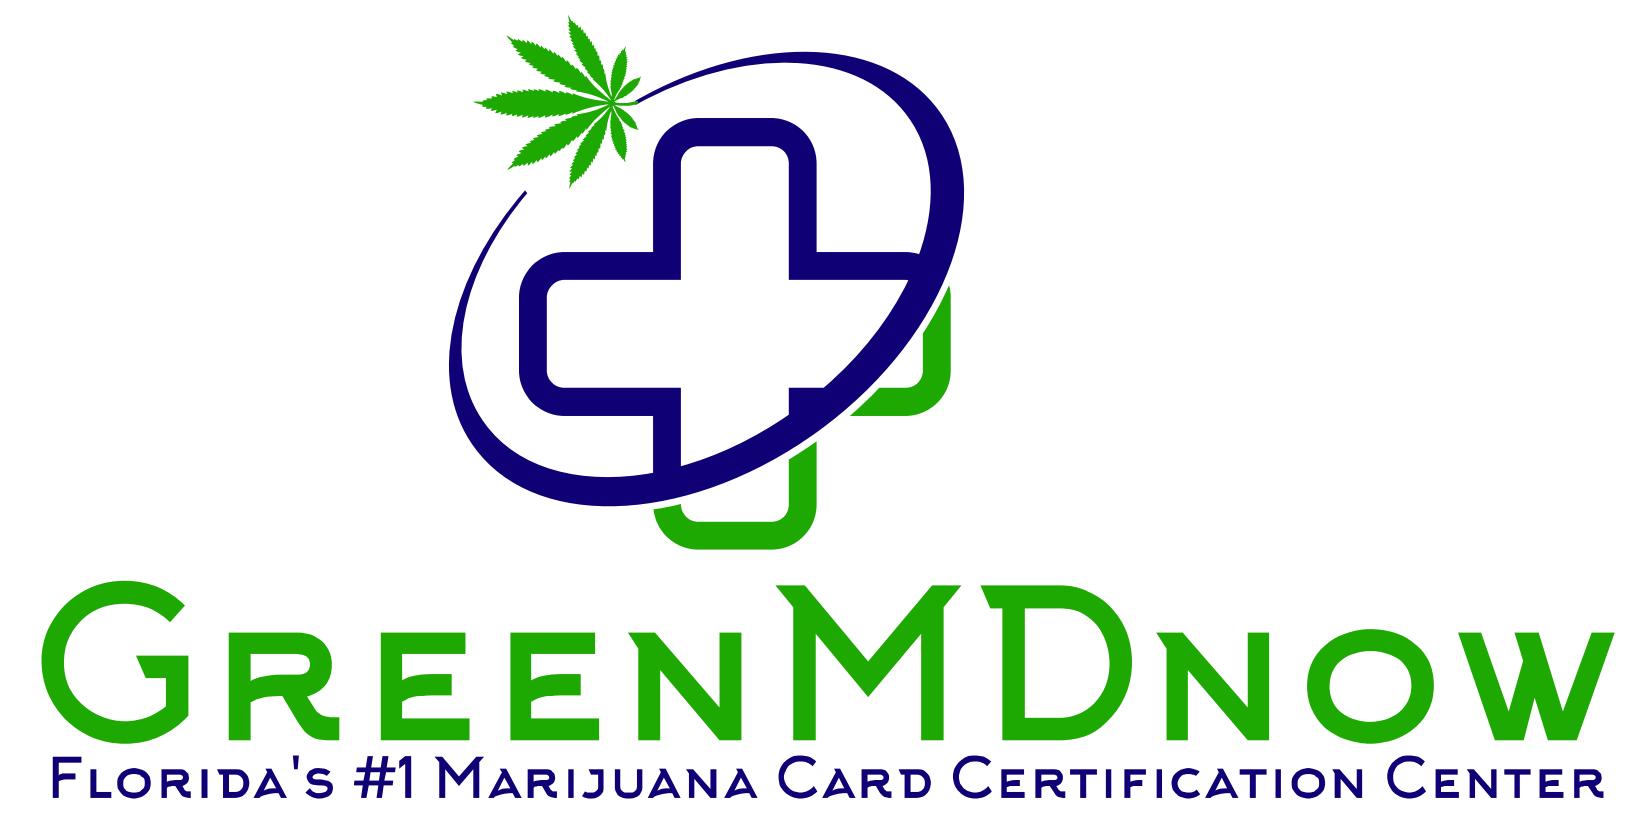 GreenMDnow